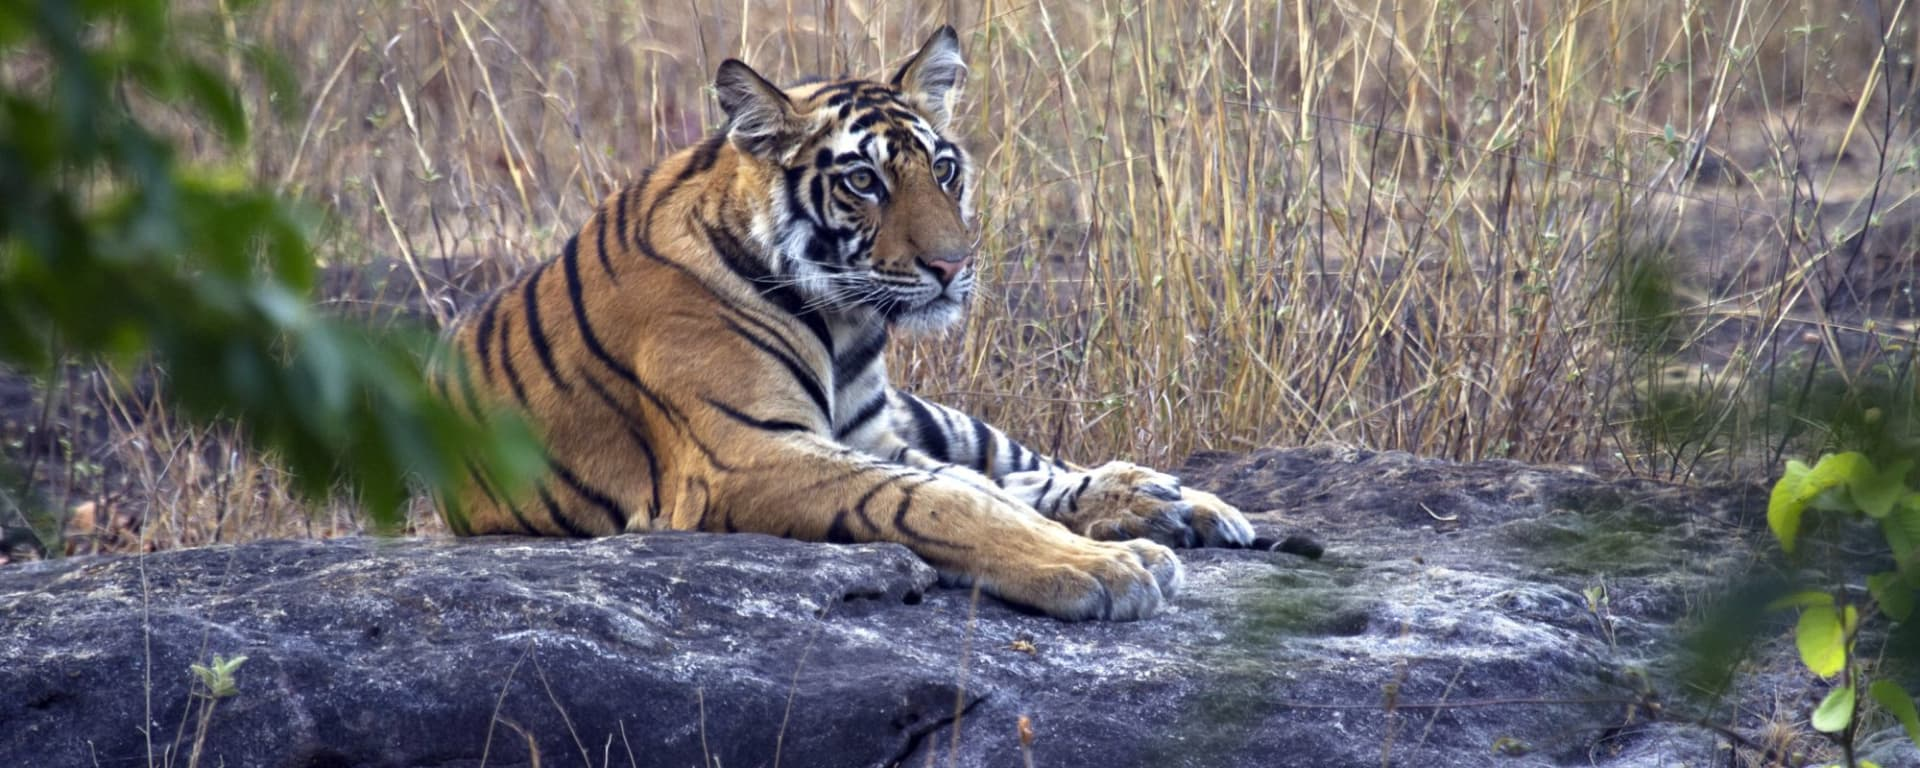 Taj Mahal & Tiger Safaris ab Delhi: Tiger Bandhavgarh NP